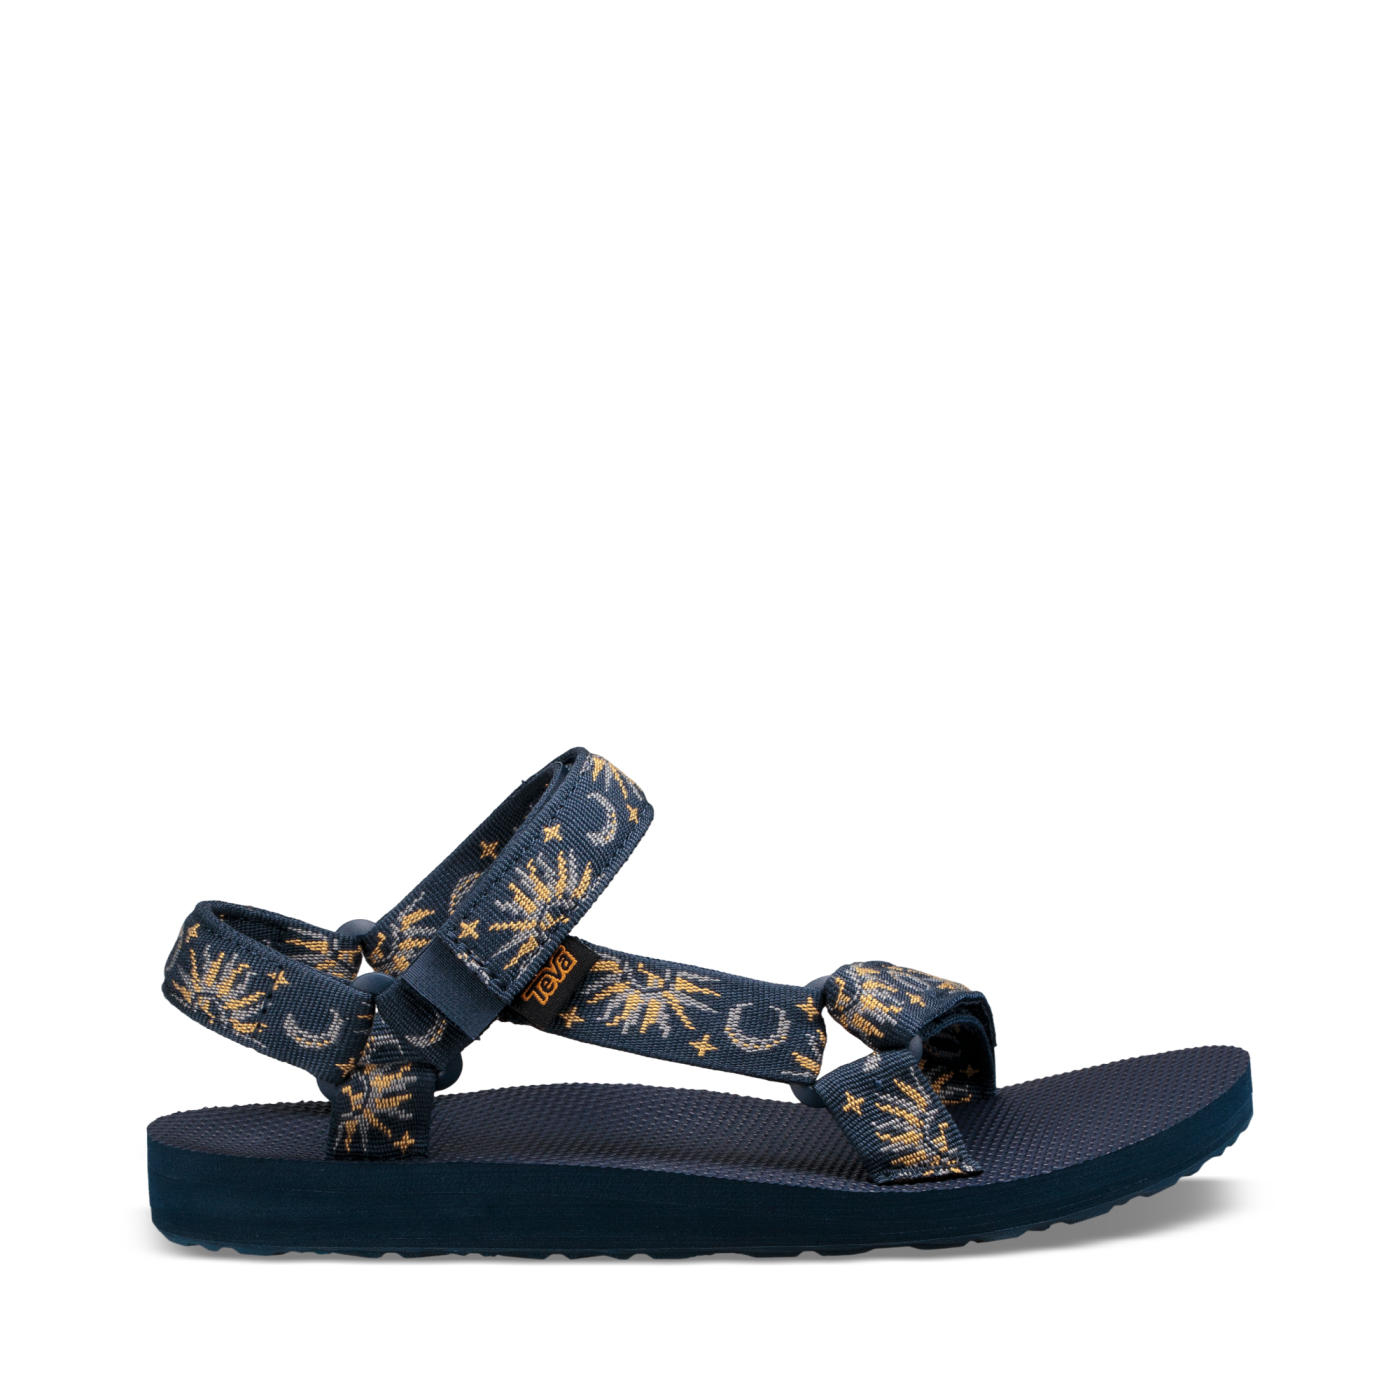 Original Universal Sandal - Women's